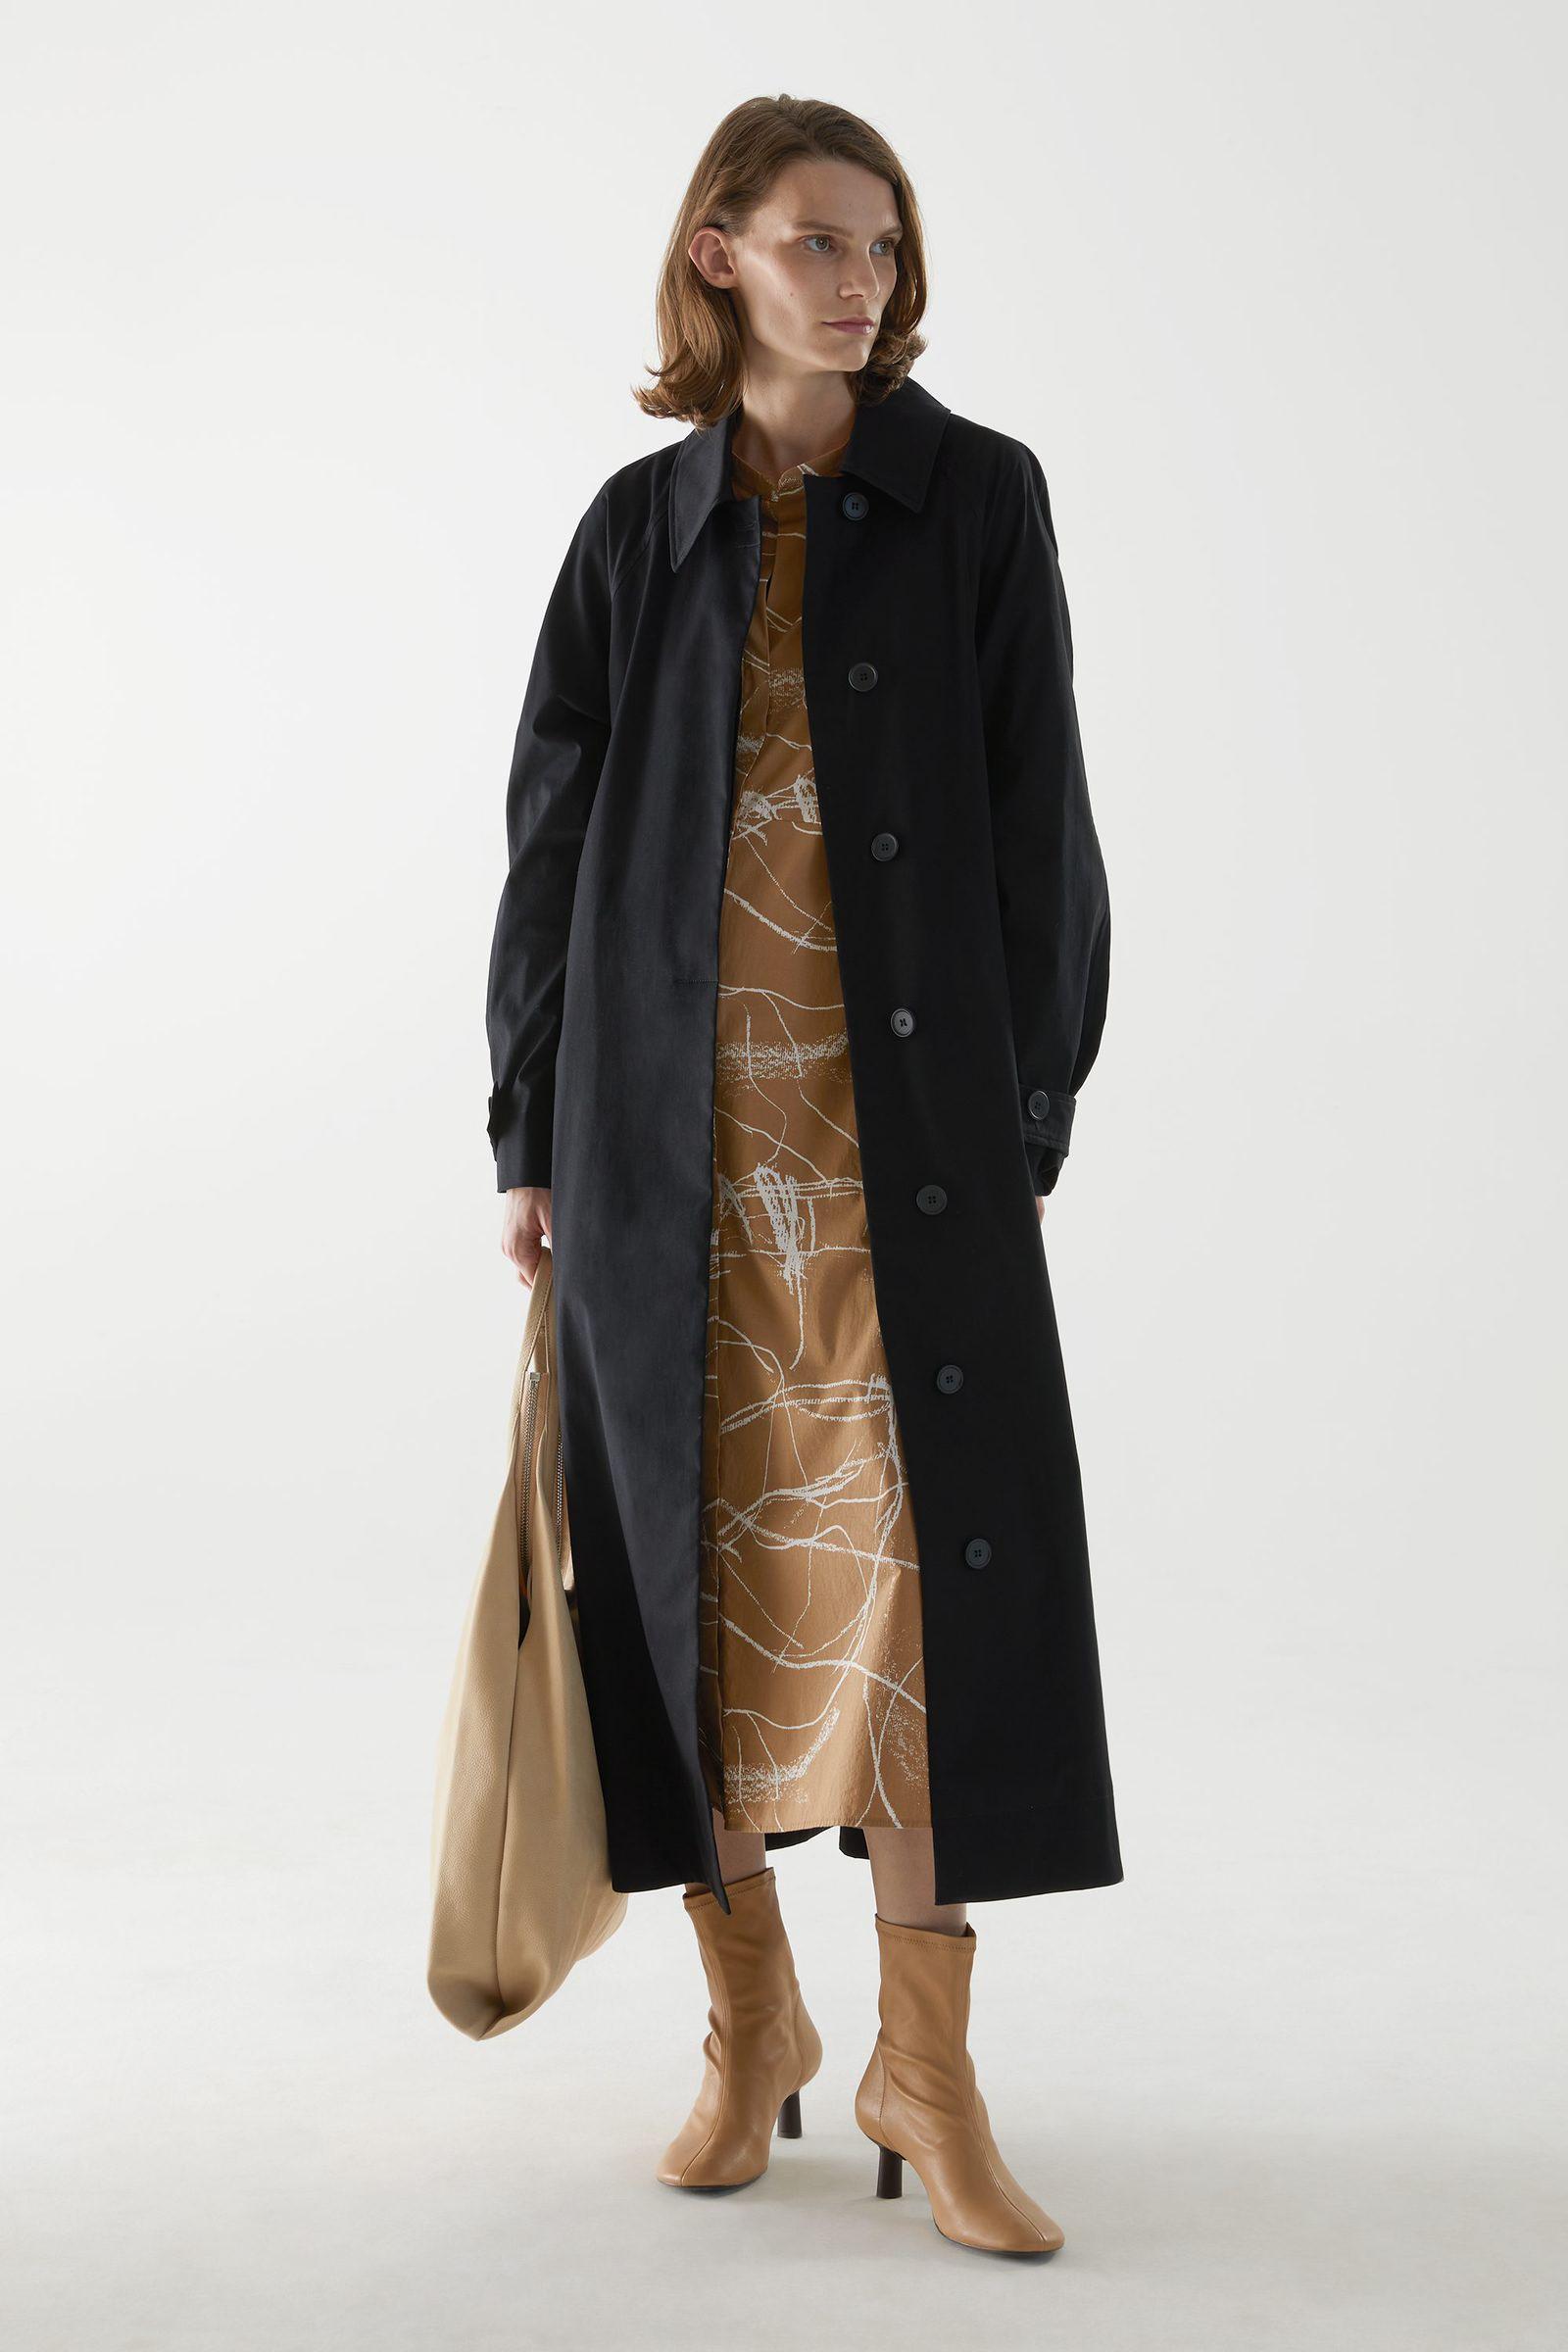 COS 코튼 칼라리스 셔츠 드레스의 브라운 / 화이트컬러 ECOMLook입니다.